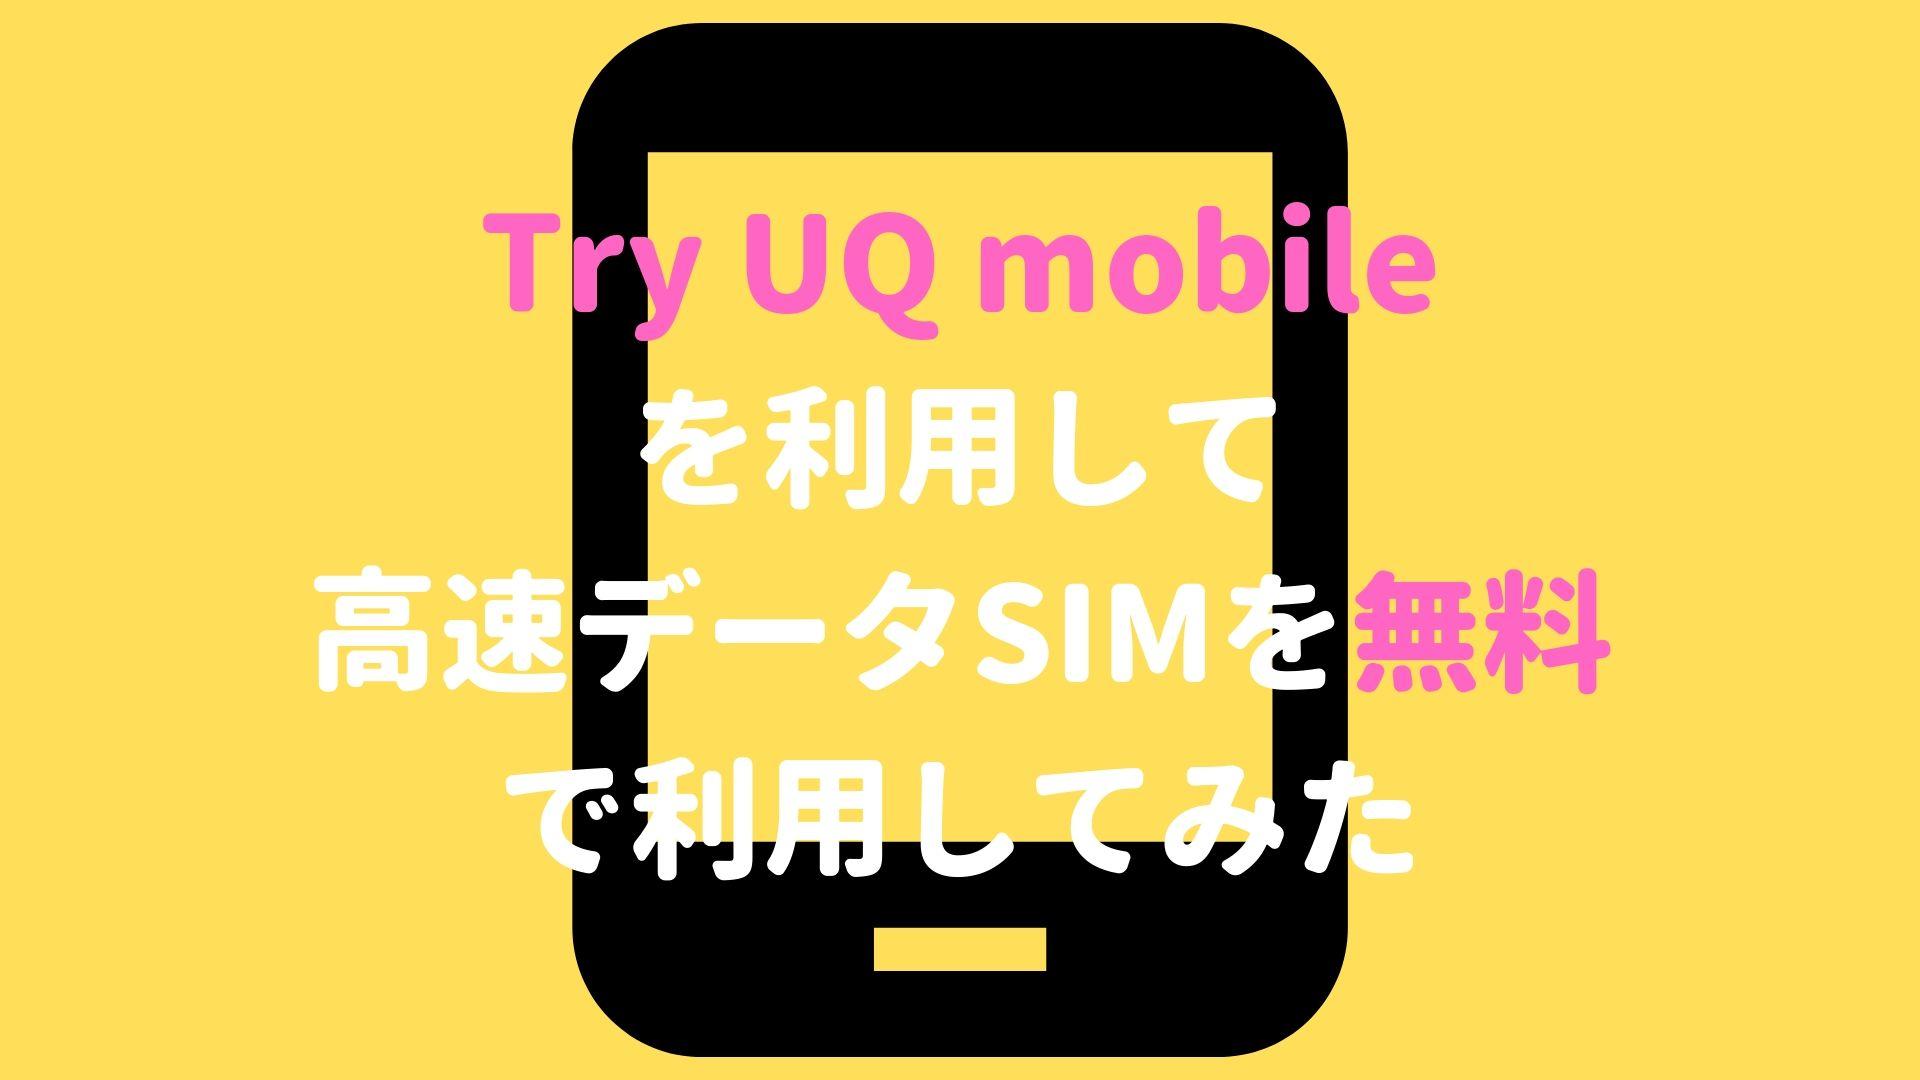 Try-UQ-mobile